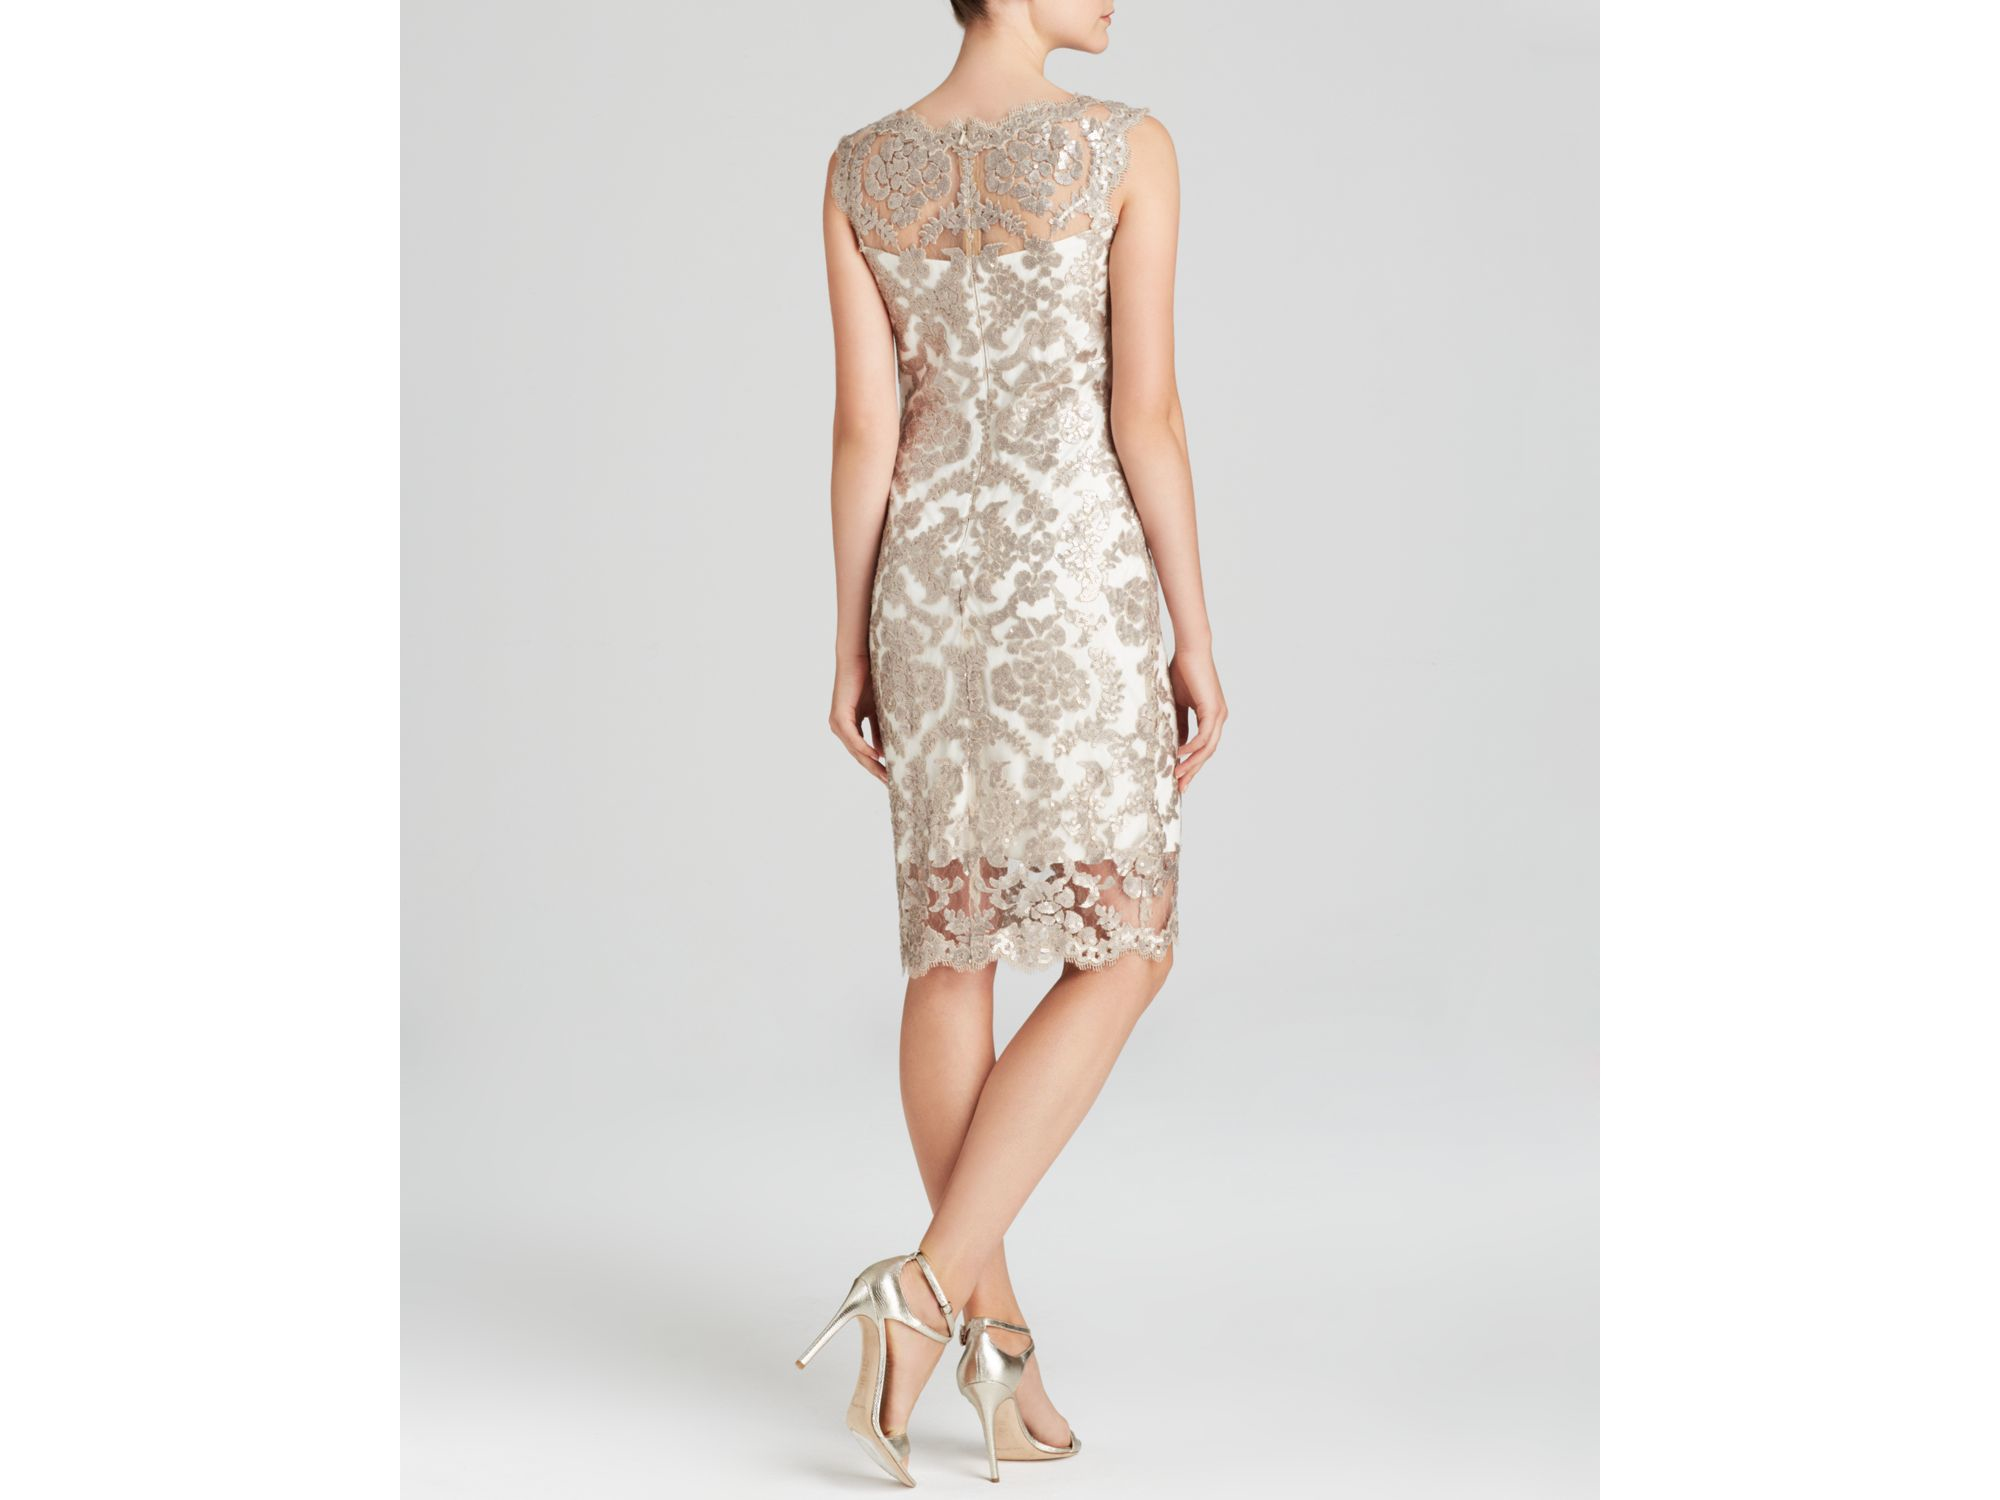 Lyst - Tadashi Shoji Dress - Sleeveless Illusion Neckline Sequin ...